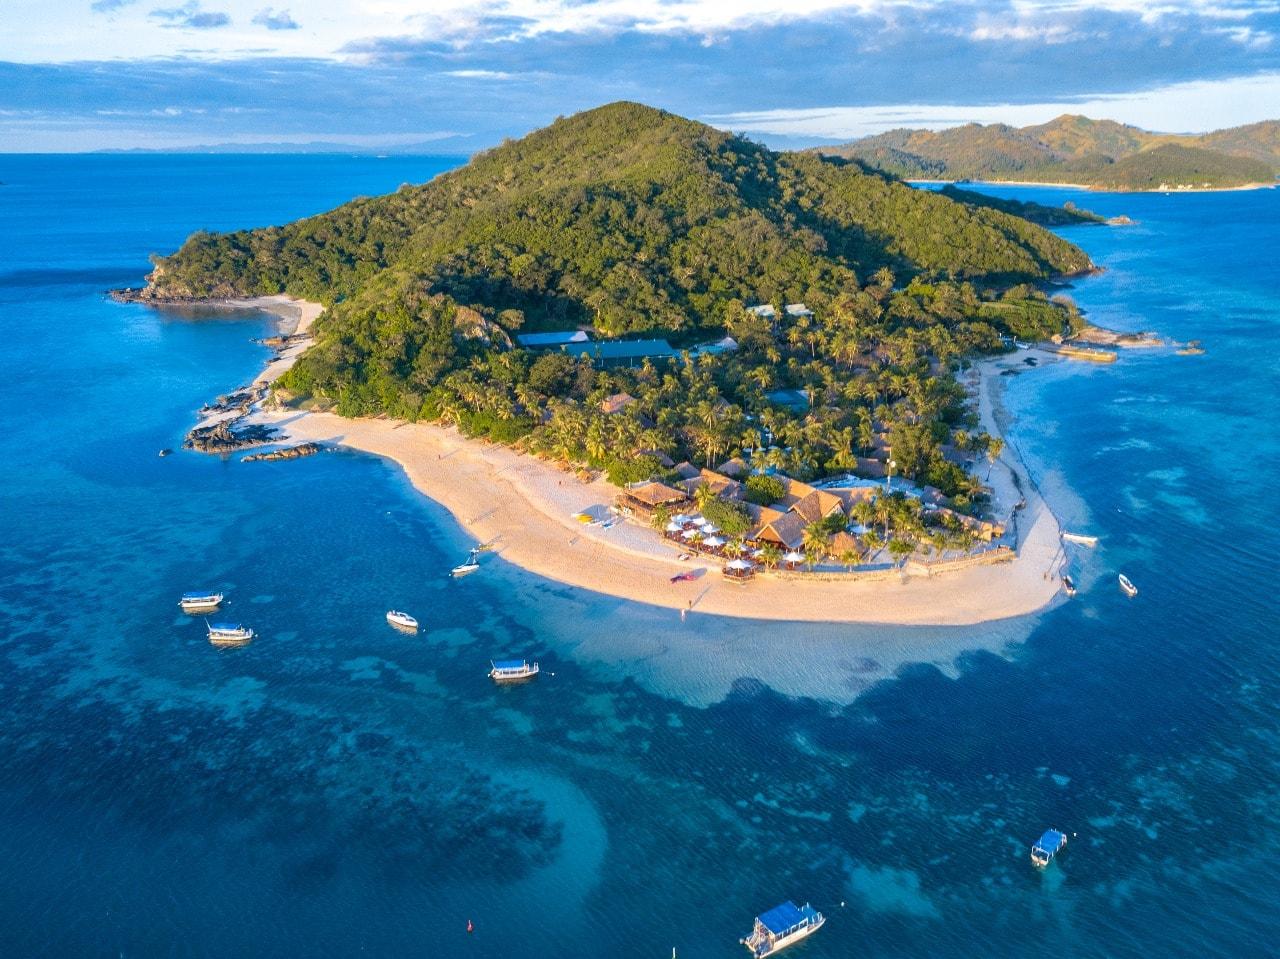 Castaway Island Resort entire island drone shot